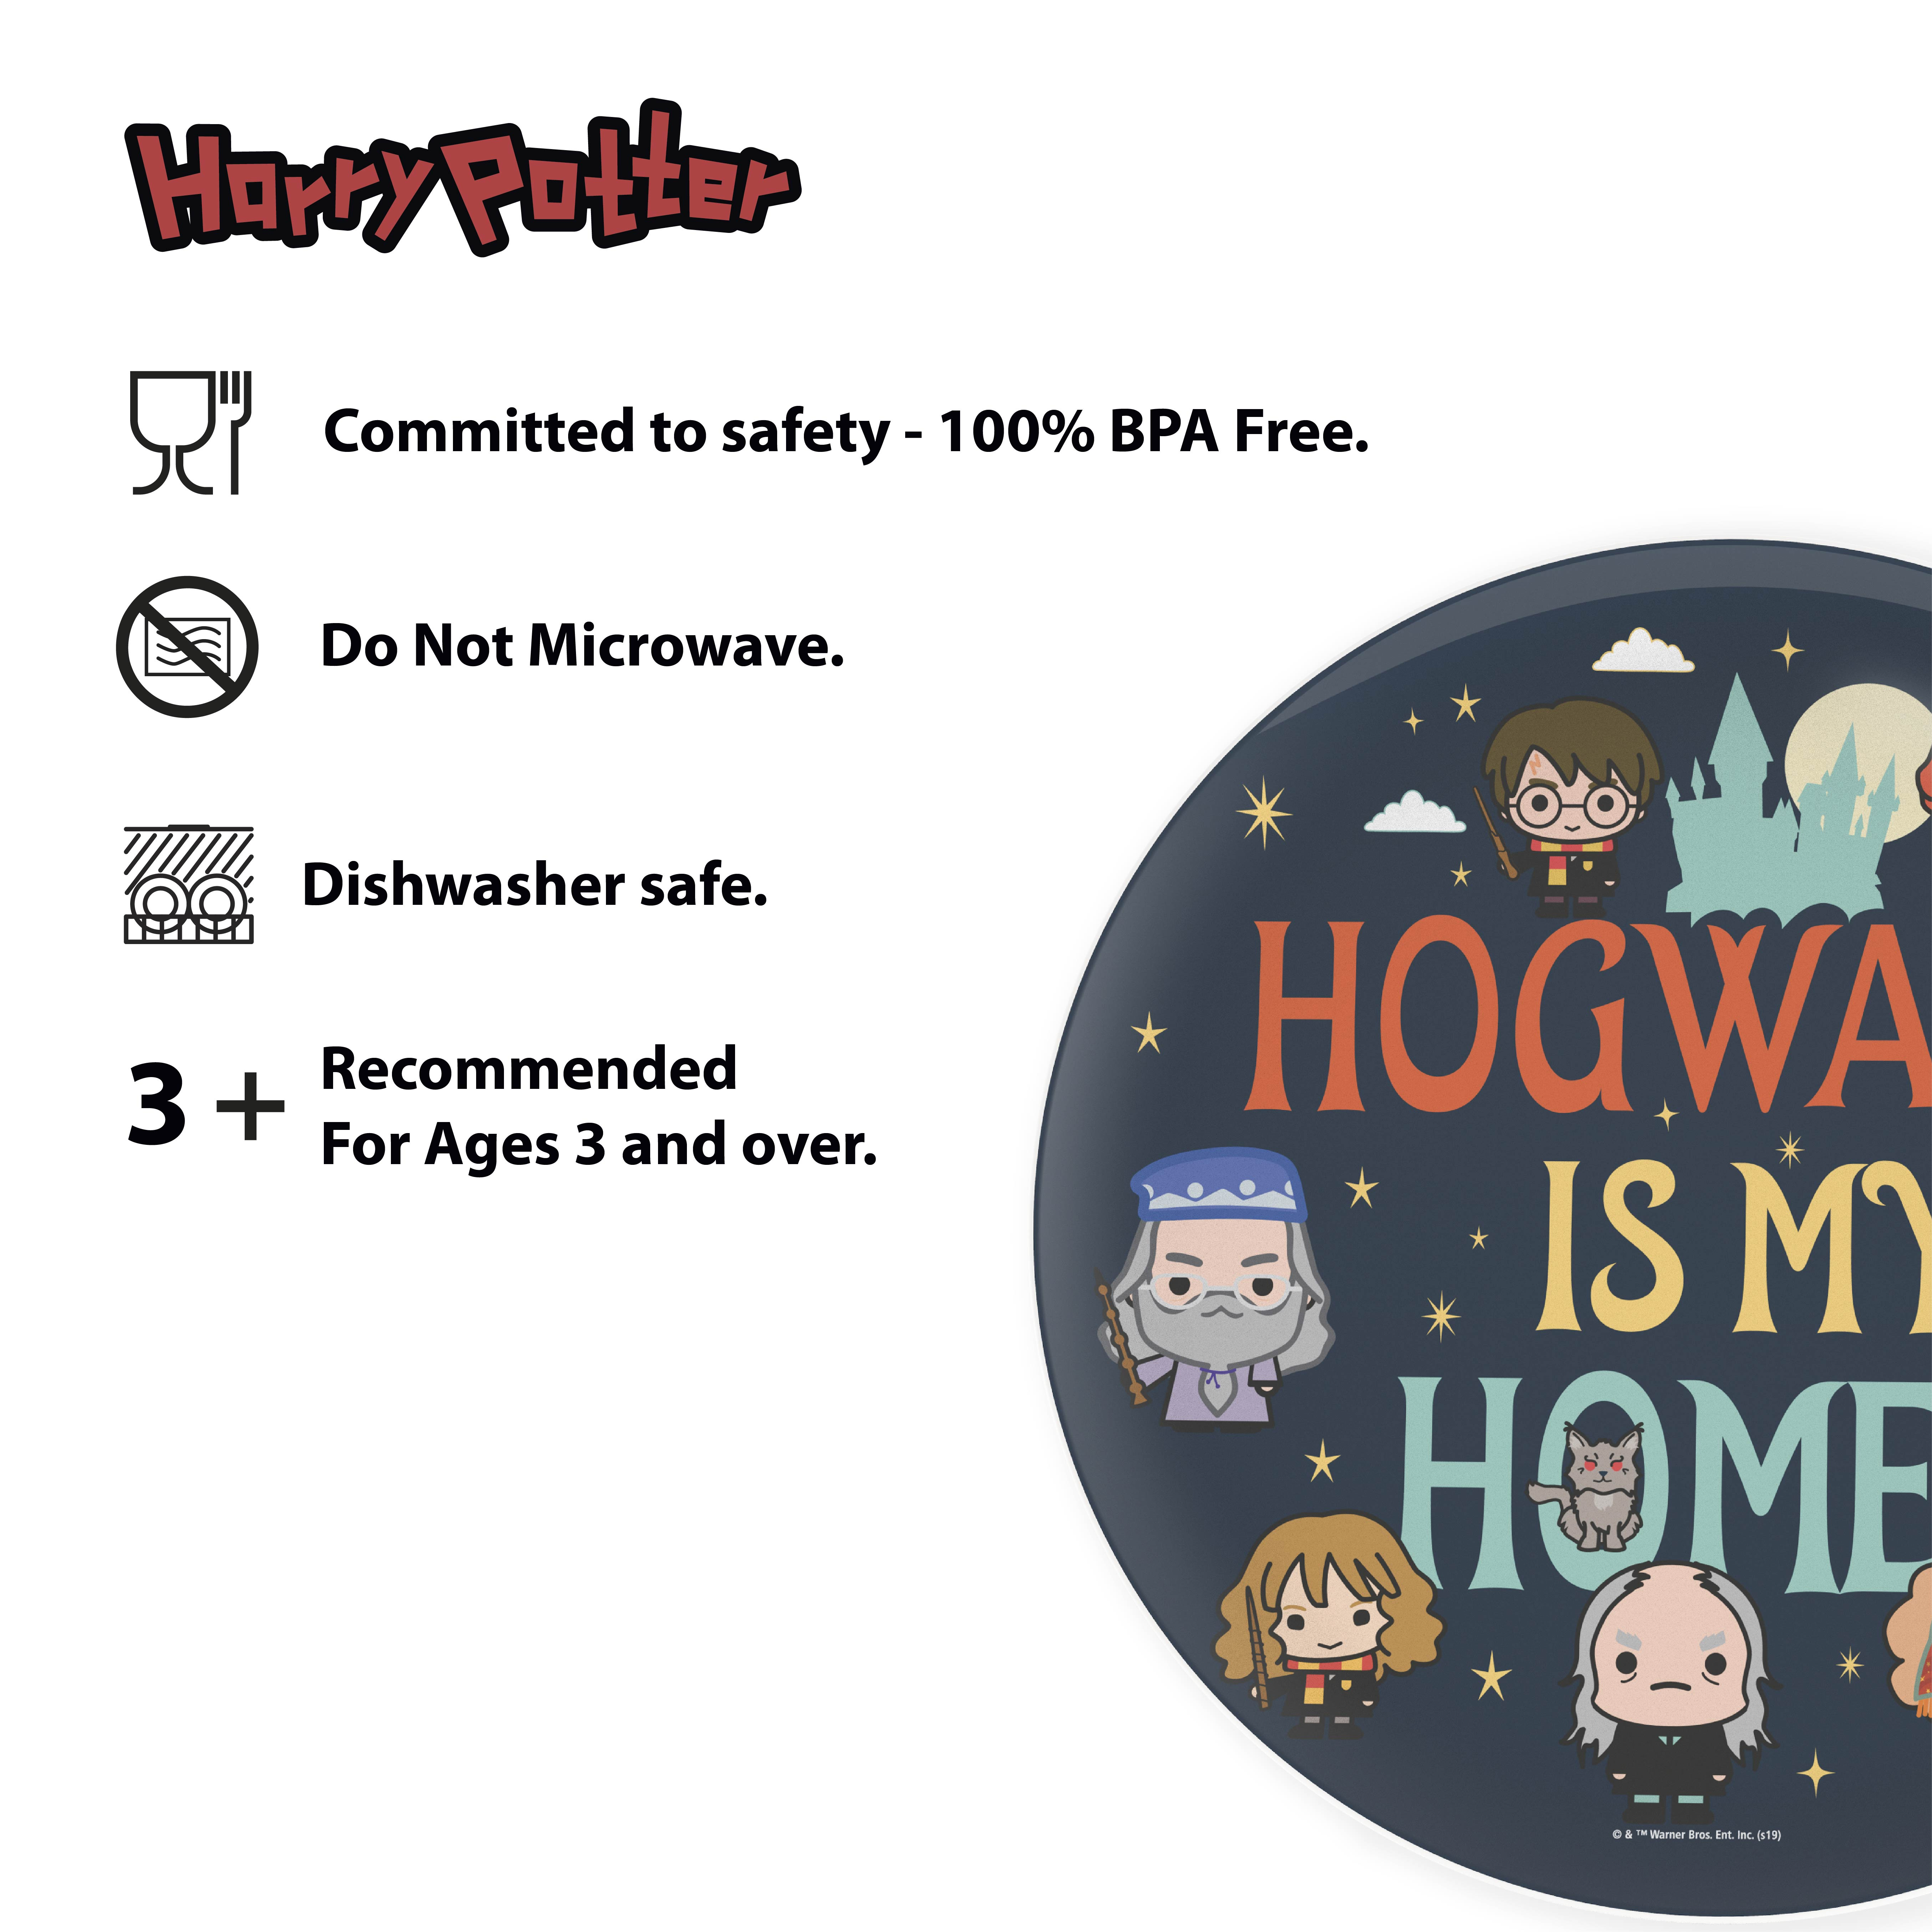 Harry Potter Dinnerware Set, Hogwarts is my Home, 2-piece set slideshow image 2